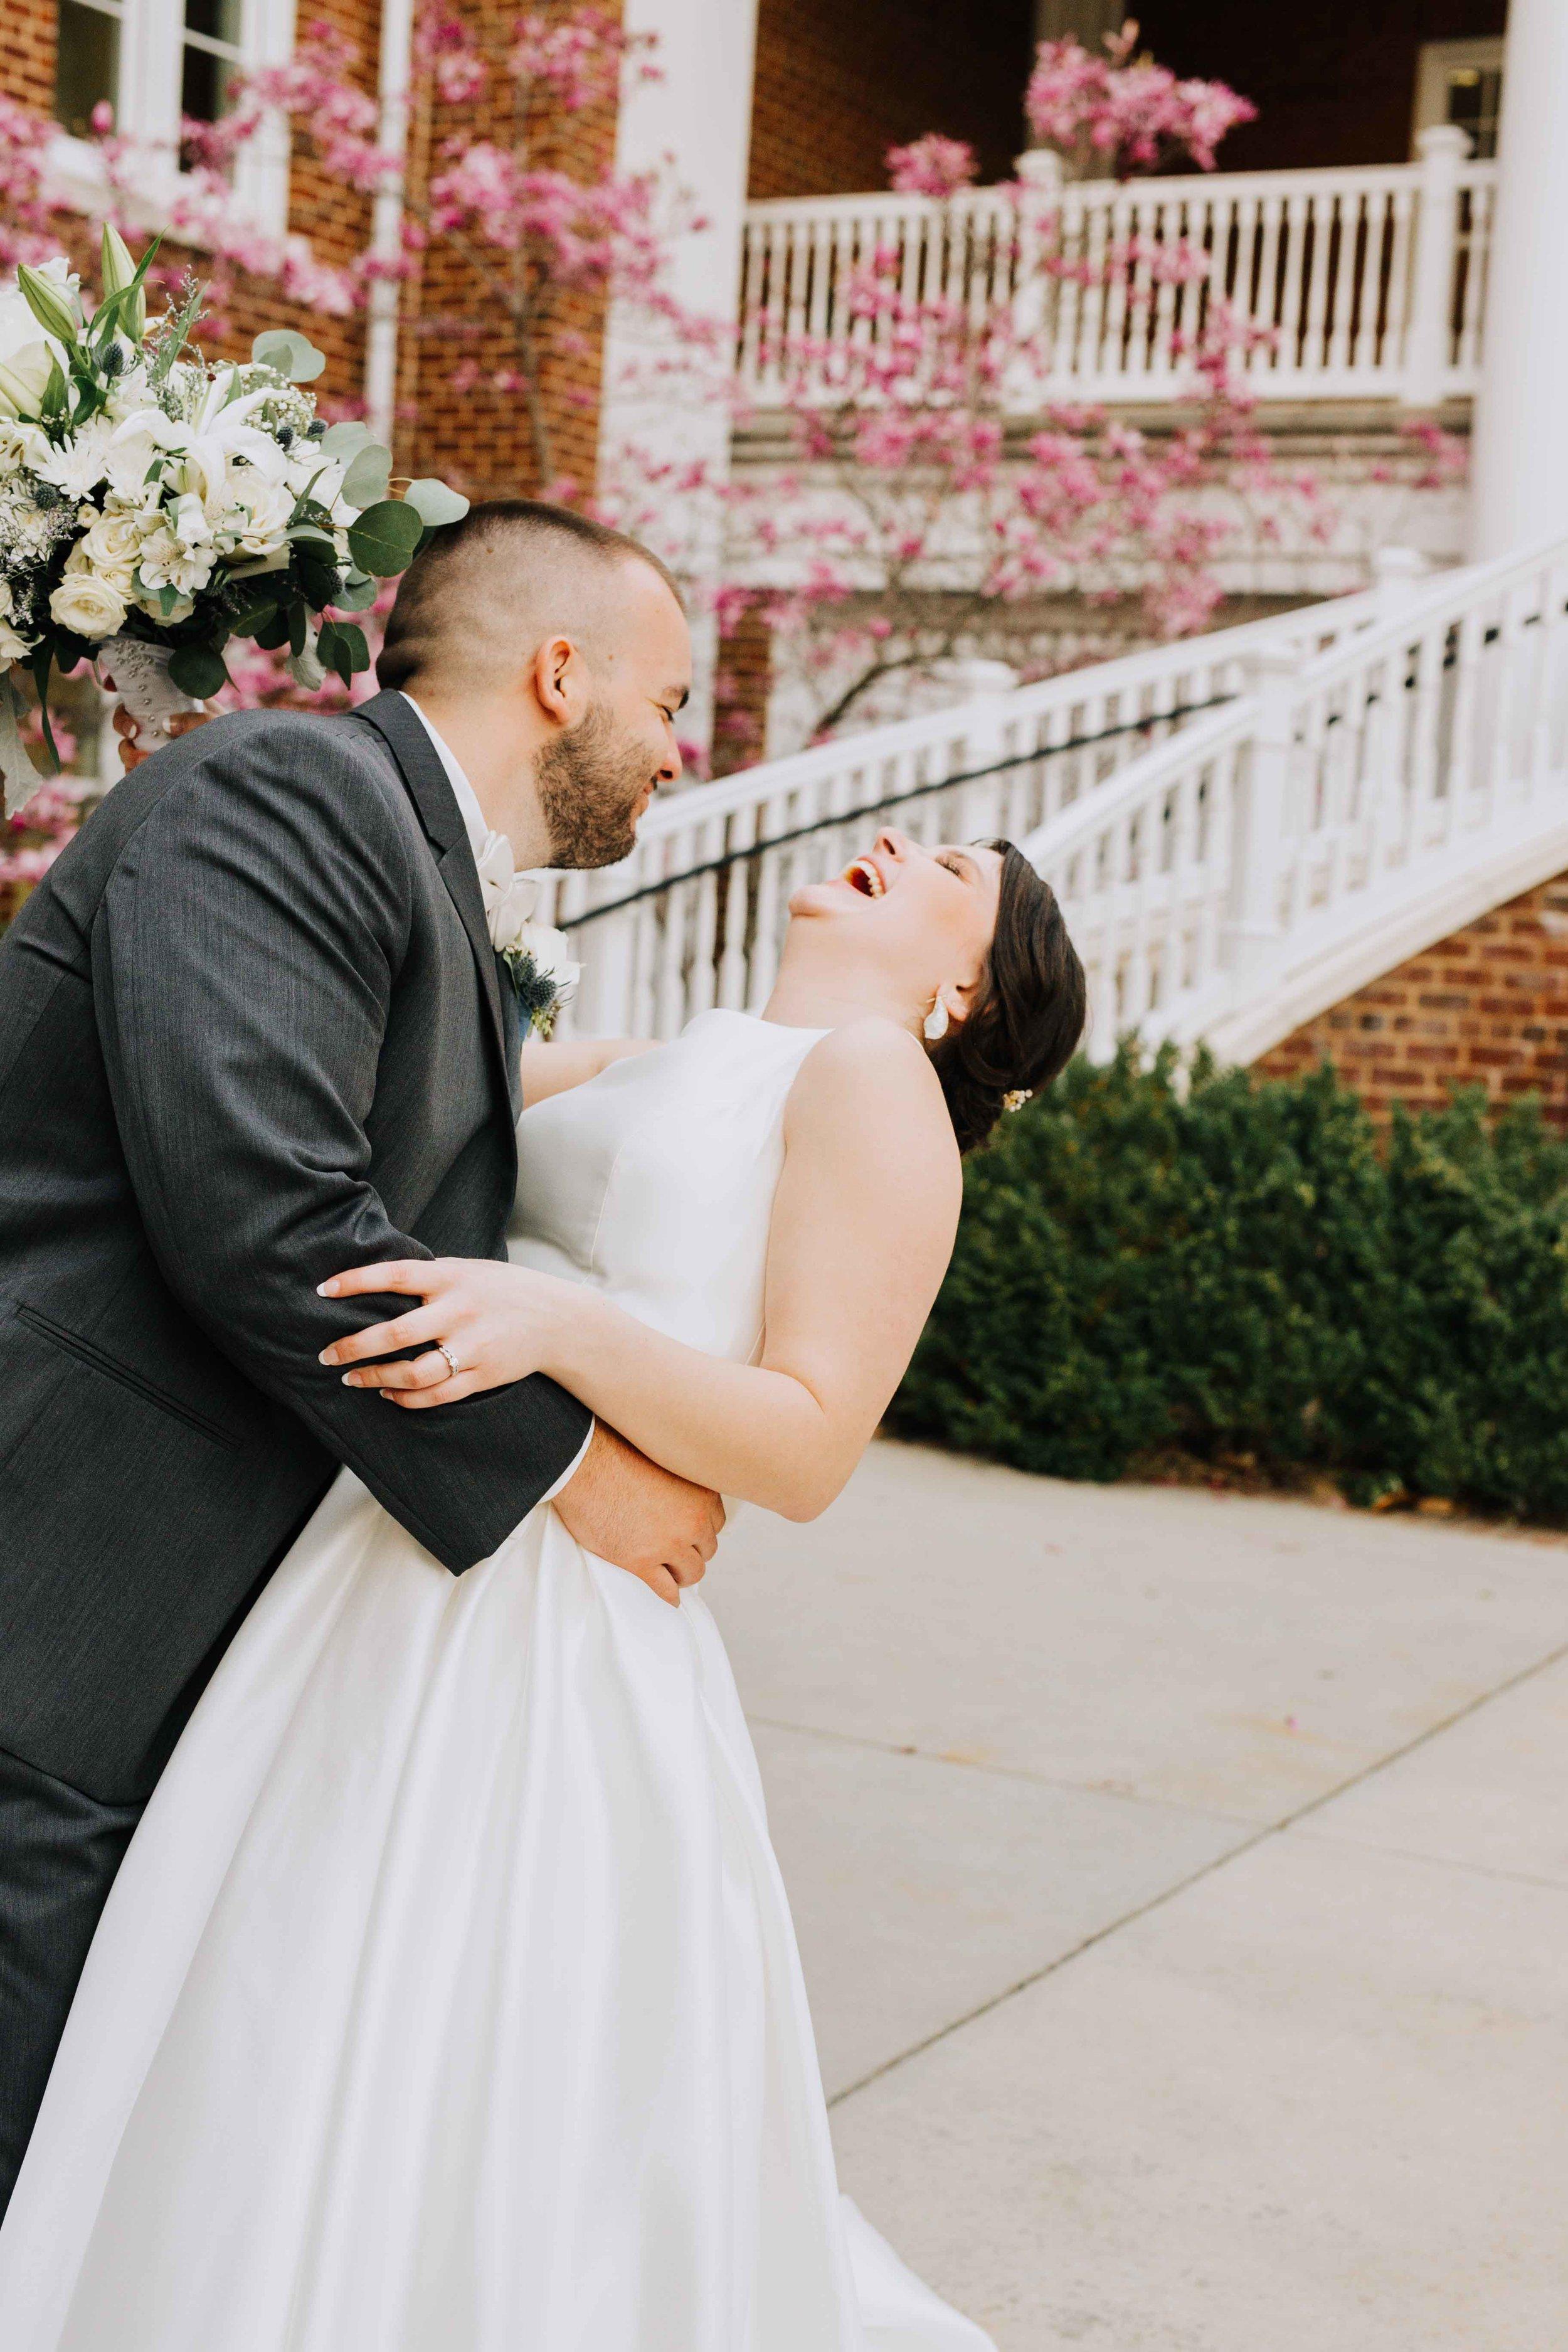 Farmville-Virginia-Wedding-Hotel-Weynoke-Downtown-Jacqueline-Waters-Photography-Detailed- (1245).jpg